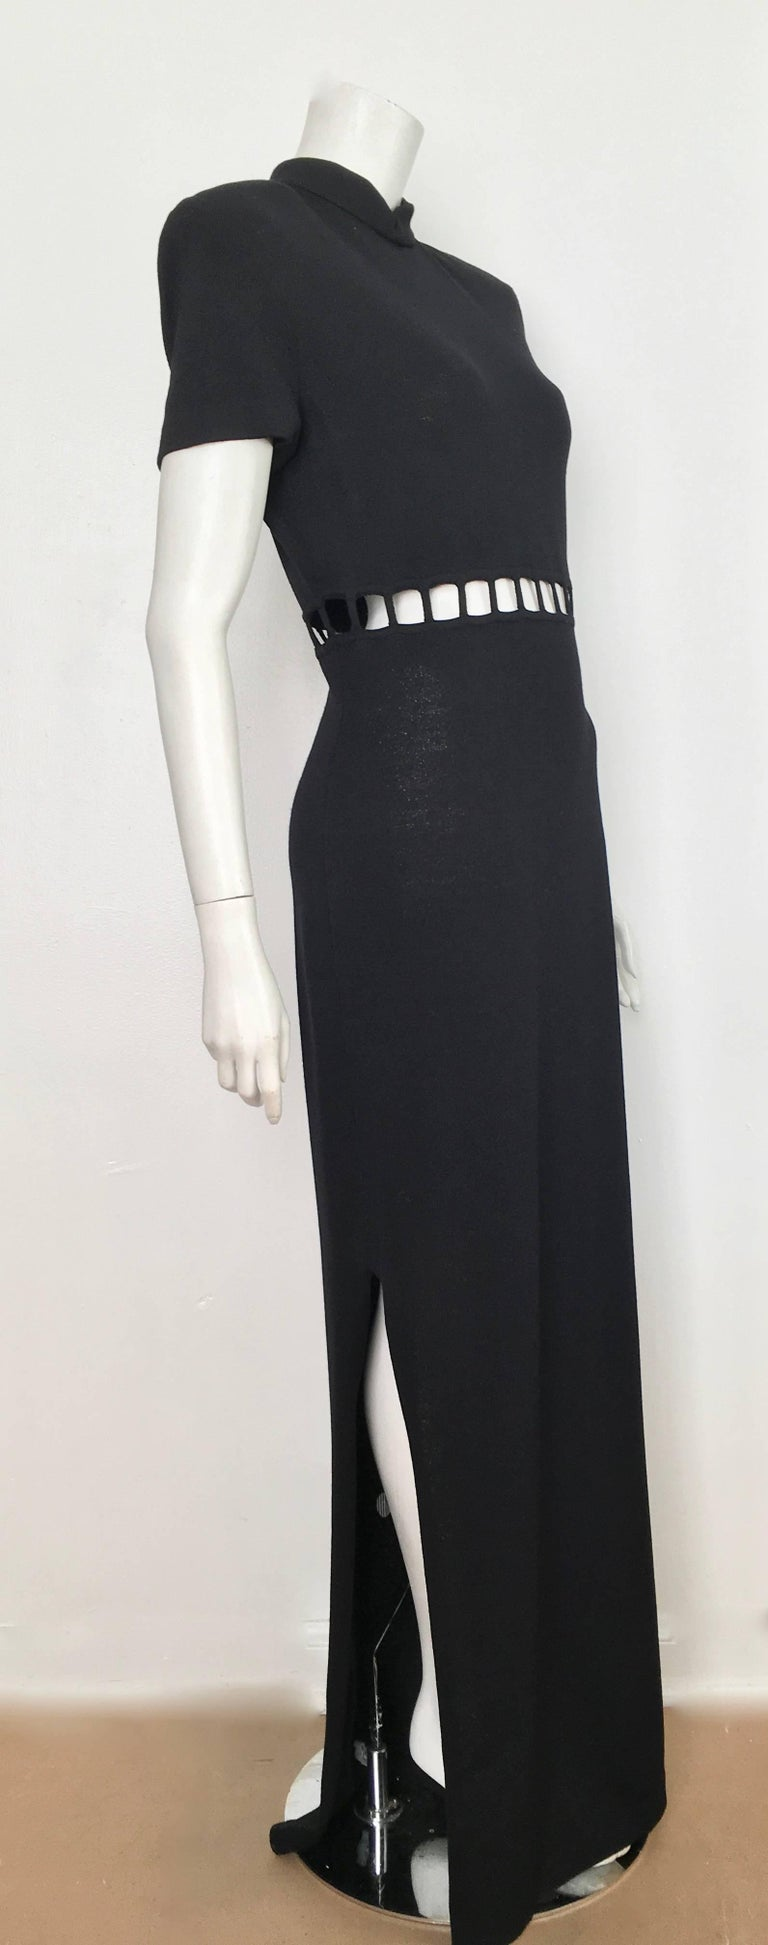 96611311f9b8 St. John Black Knit Short Sleeve Maxi Evening Dress Size 10. For ...